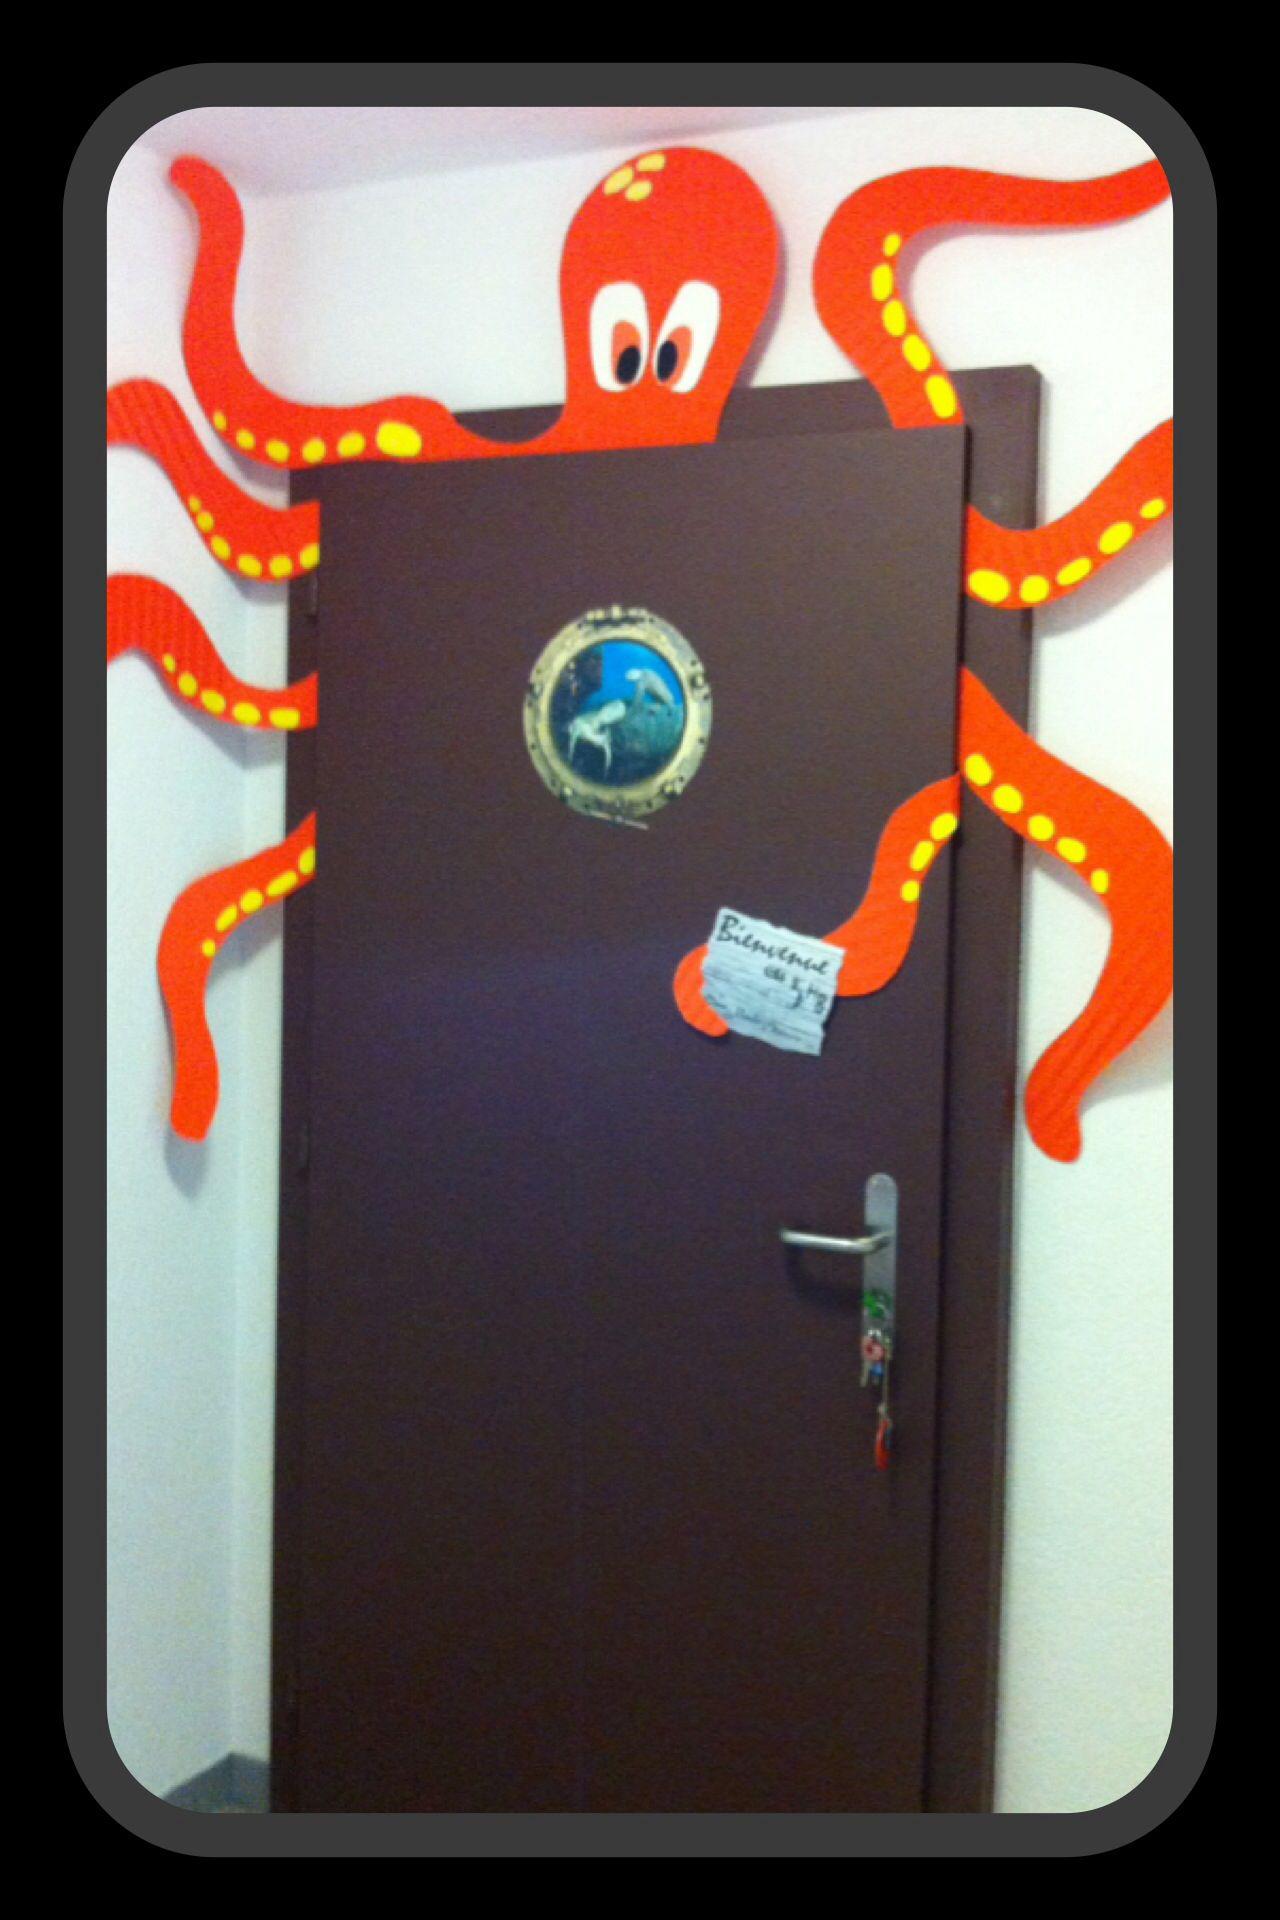 Ma porte de classe sous l oc an classroom door for Decoration porte classe halloween